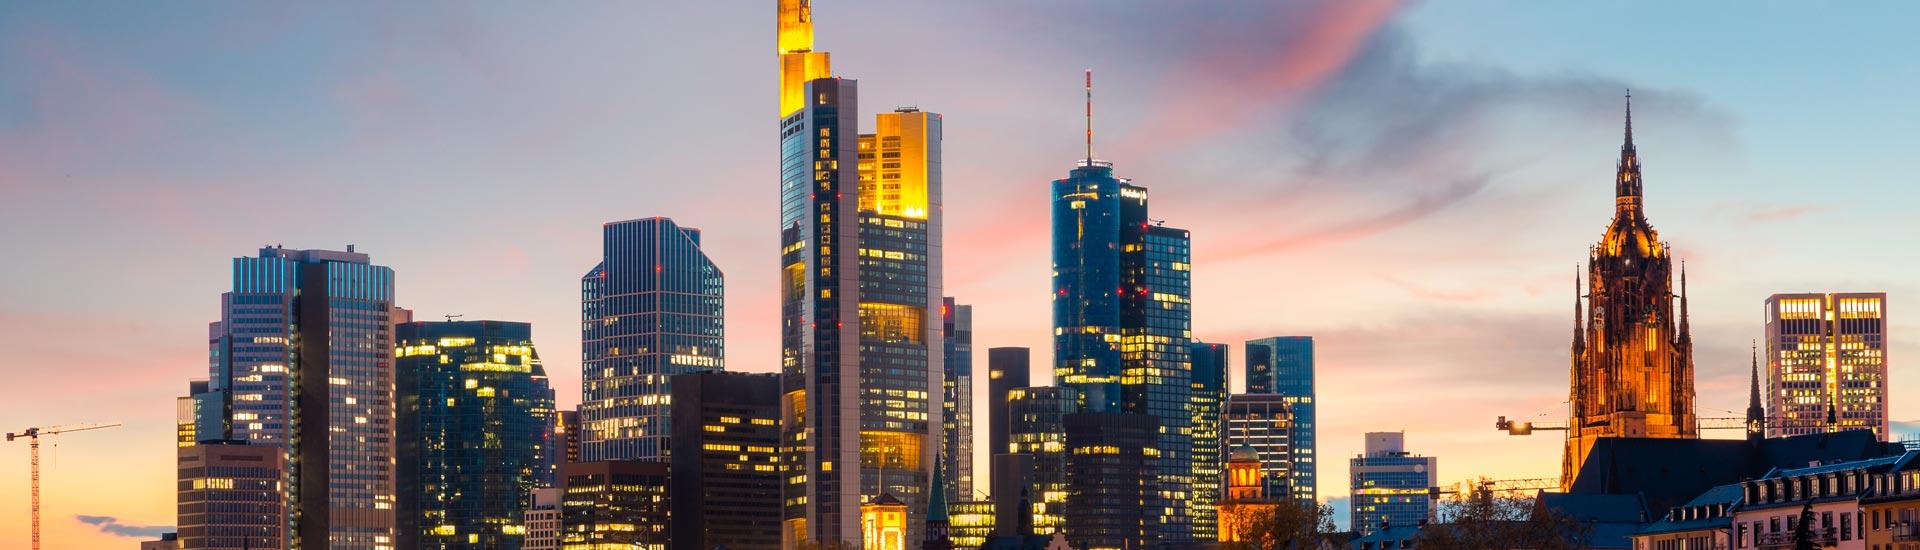 Spedition Frankfurt